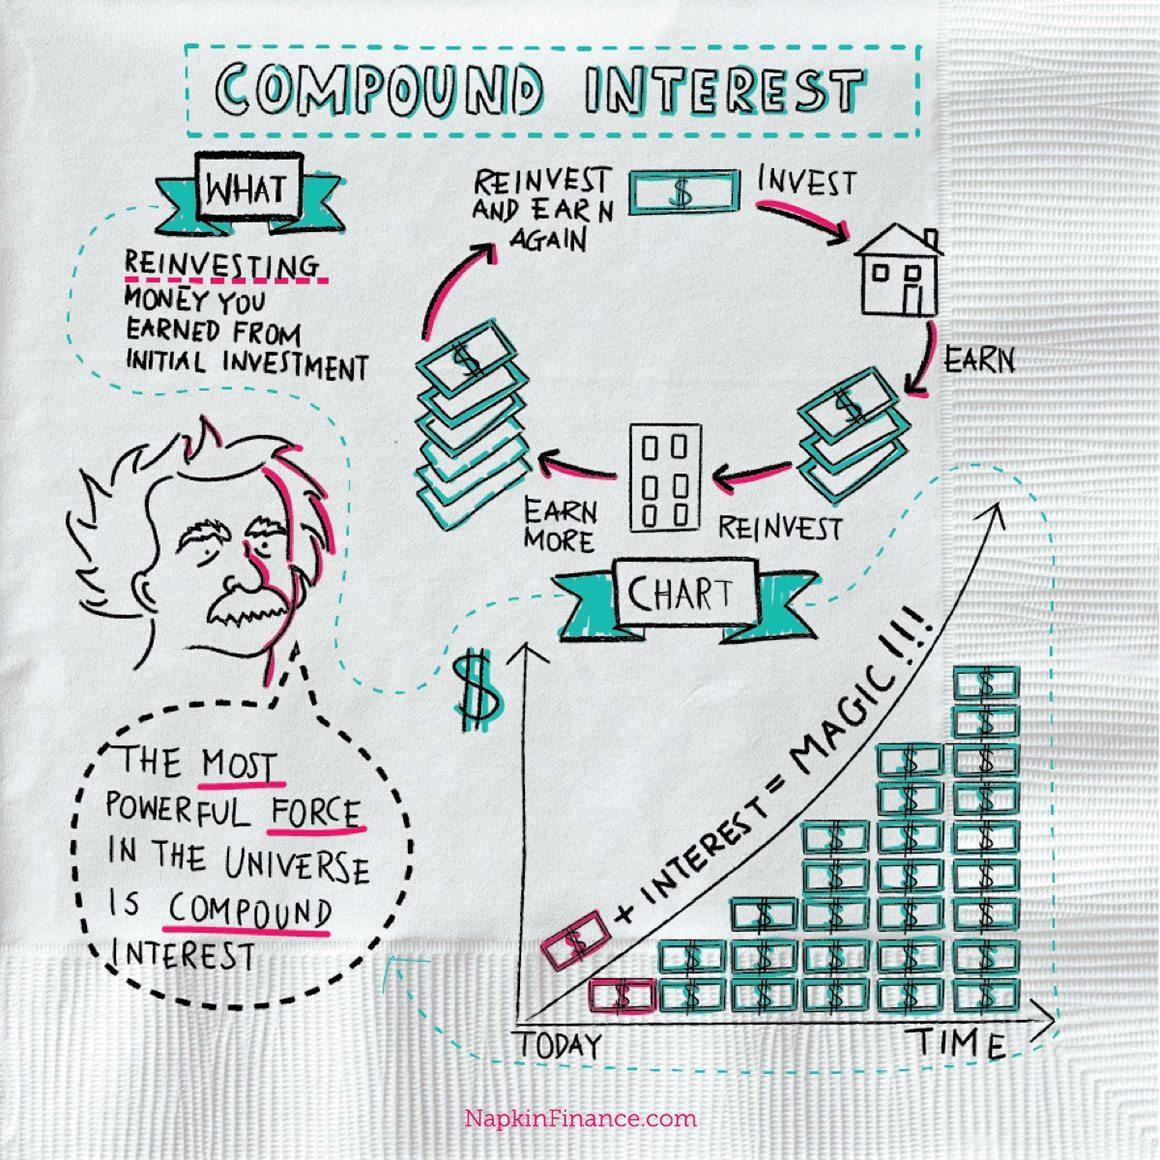 What S Compound Interest Definition Napkin Finance Has